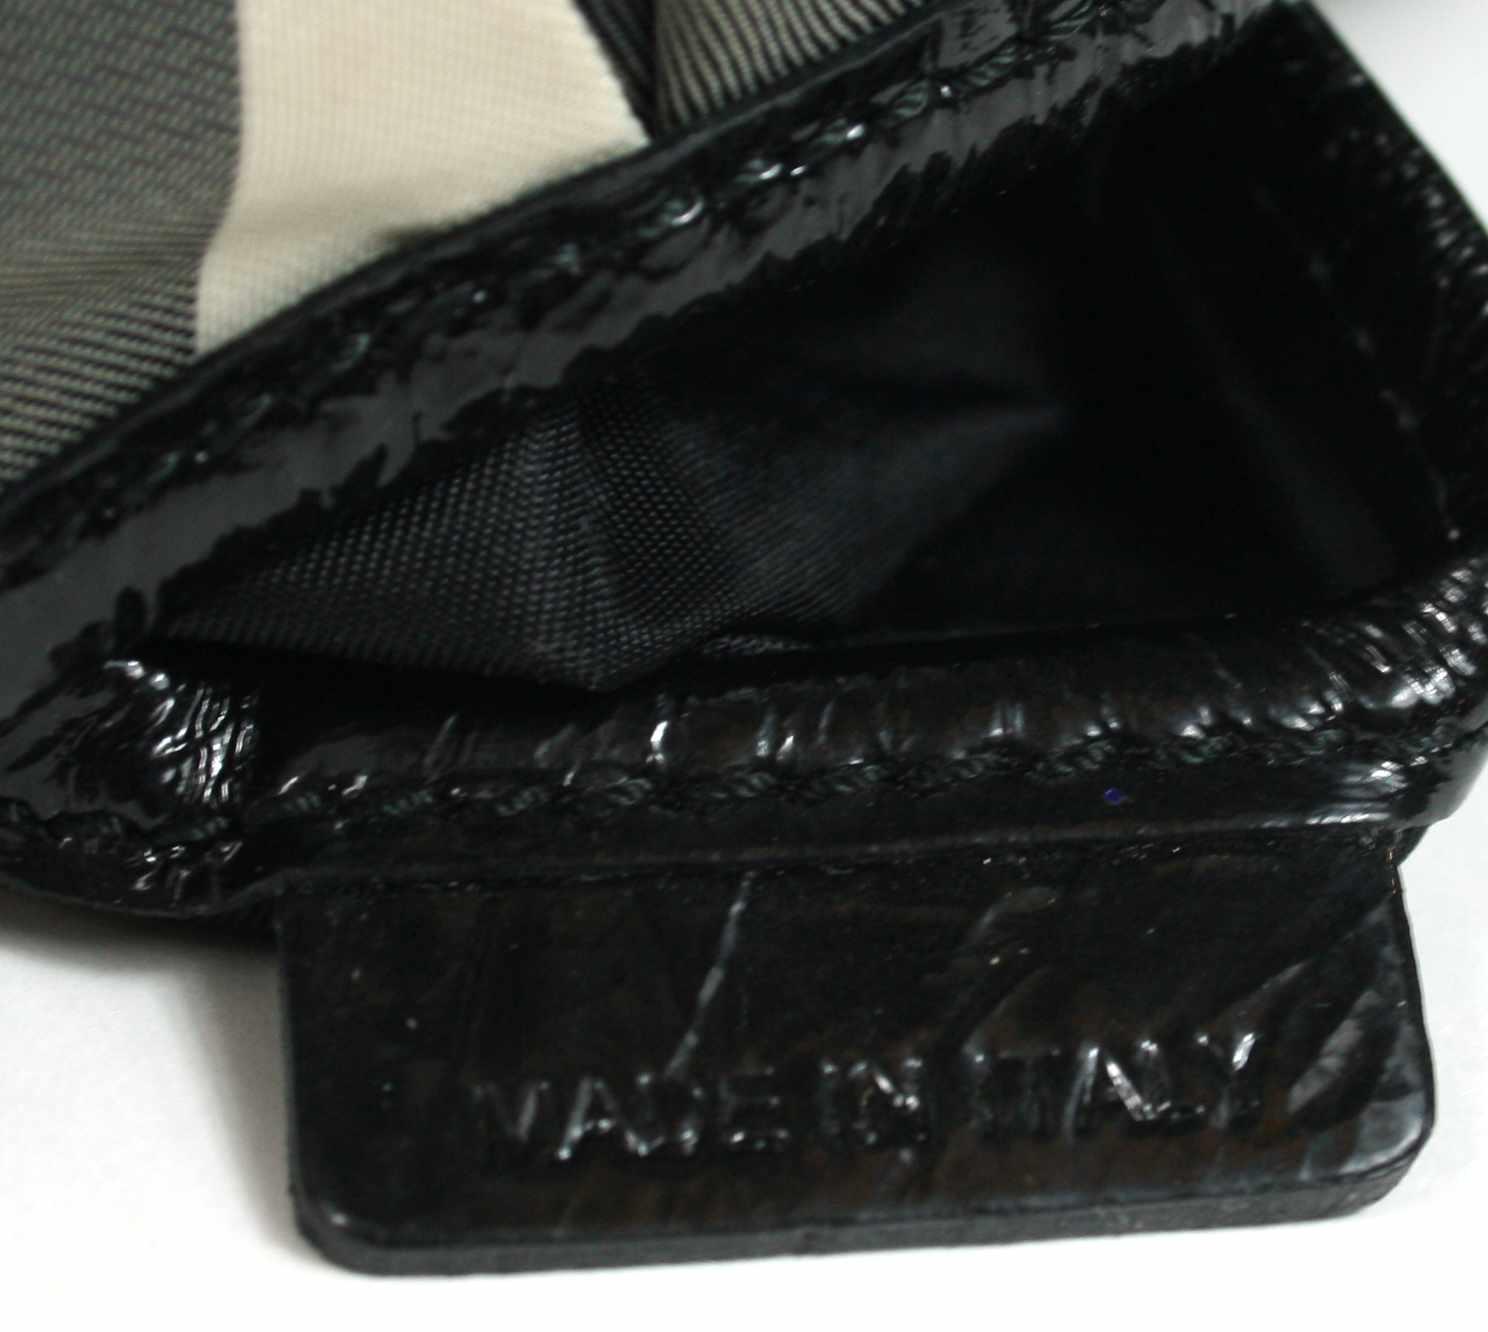 Novacheck Black Trimmings Brooklyn Hobo Bag